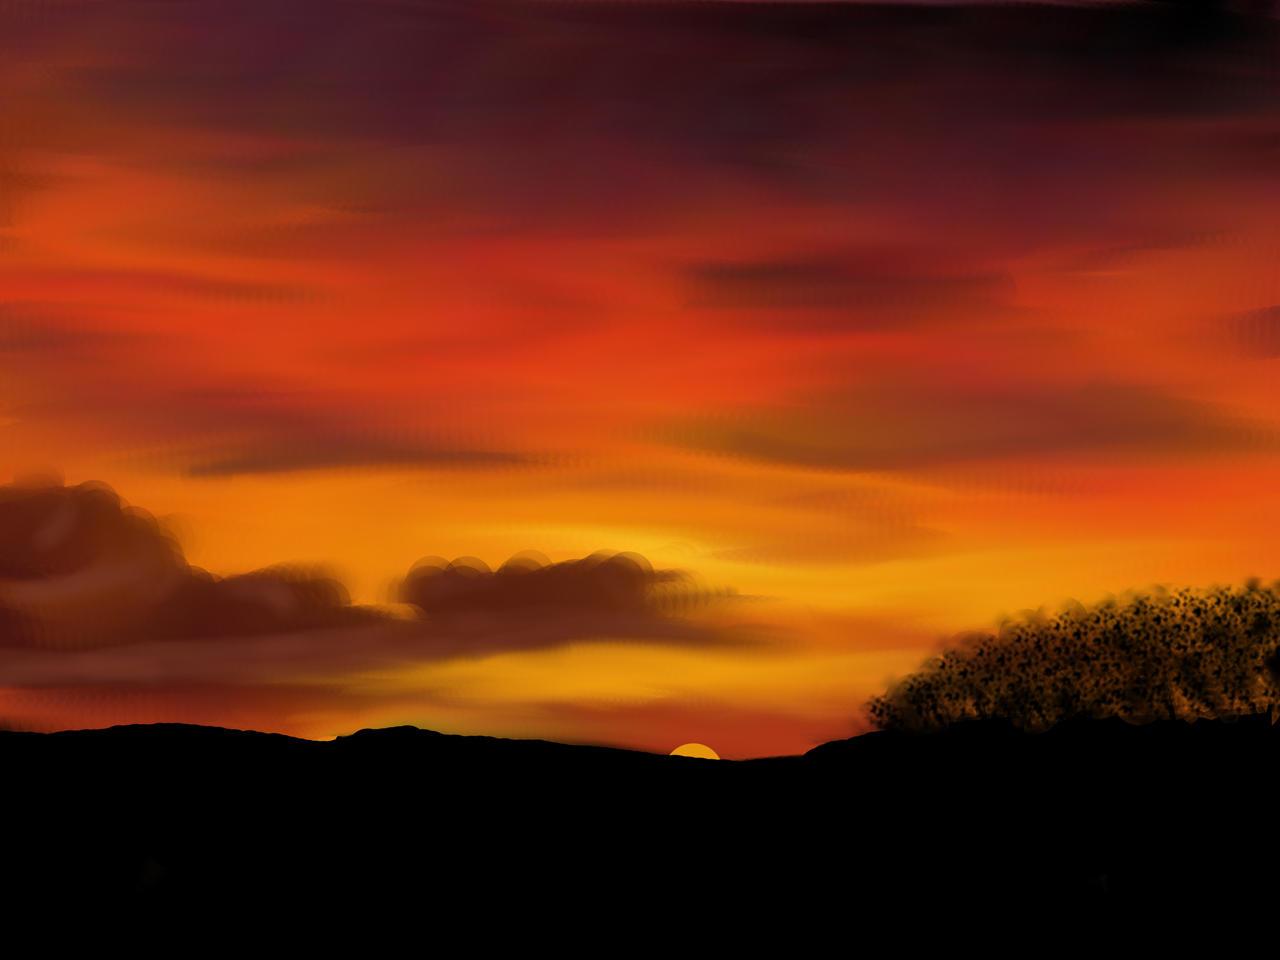 sunset drawing by strangelatiasgirl on DeviantArt